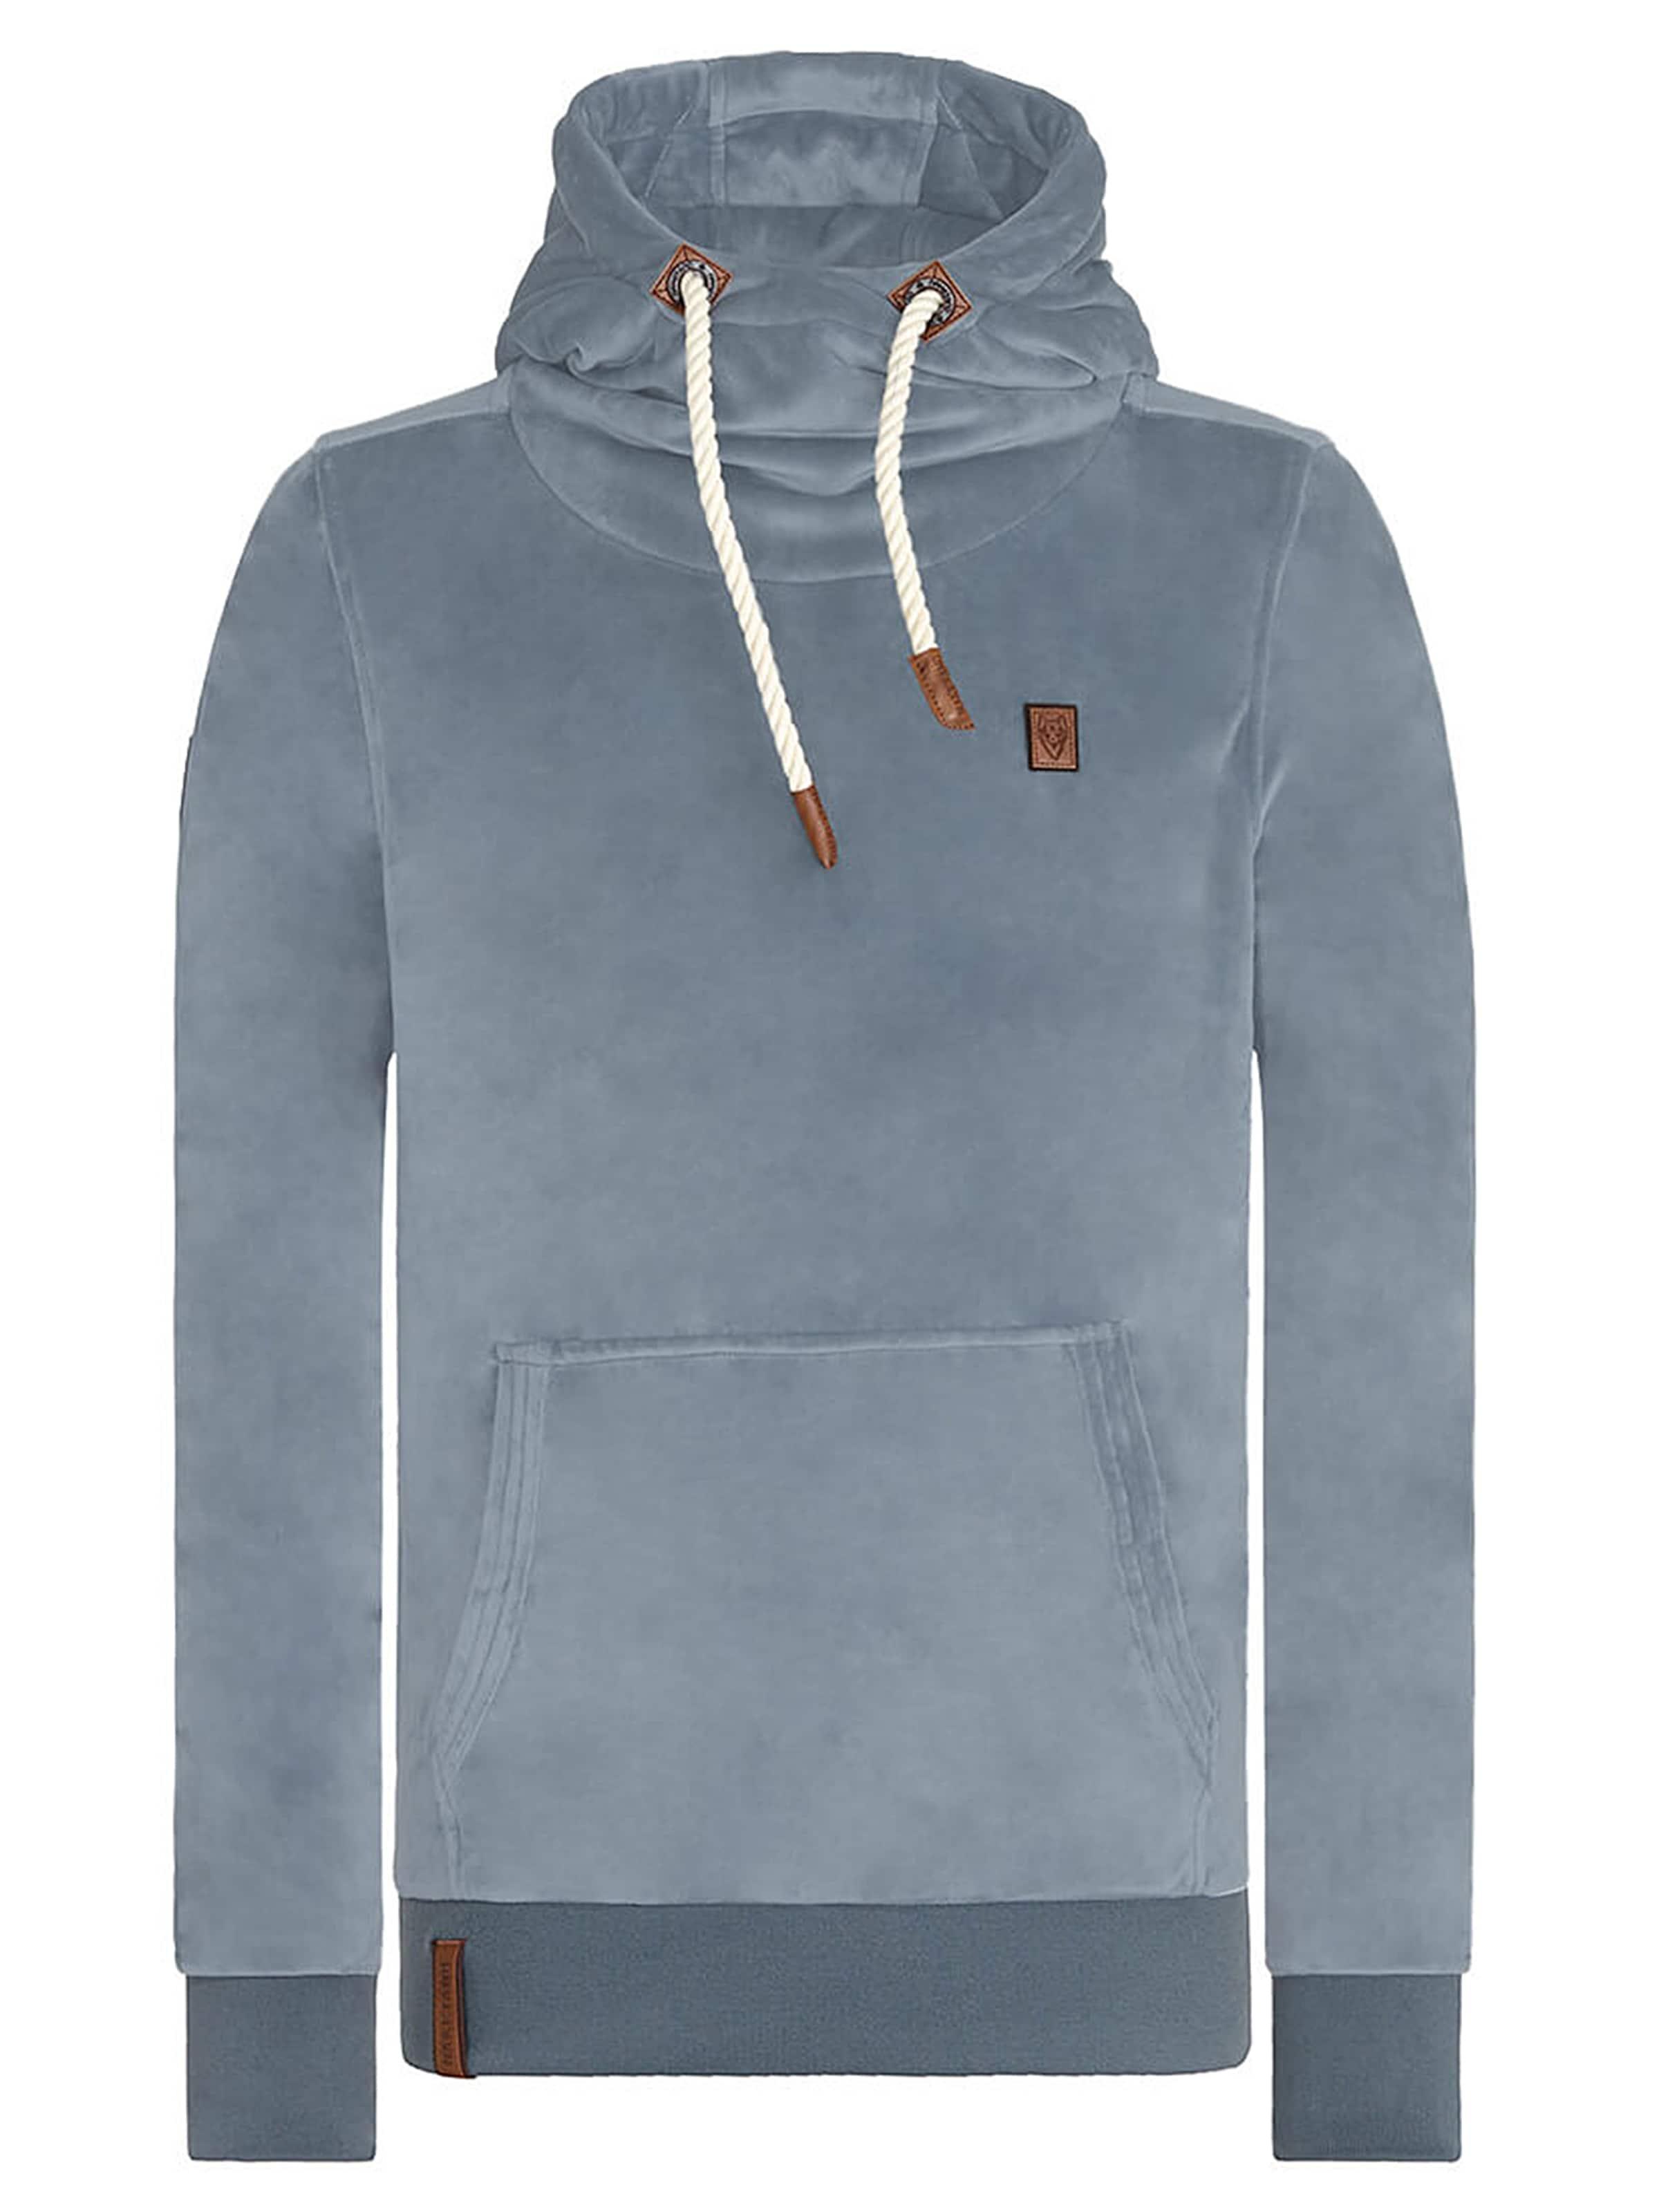 Sweater In Iii' Naketano 'mack Silbergrau lFJcTK1